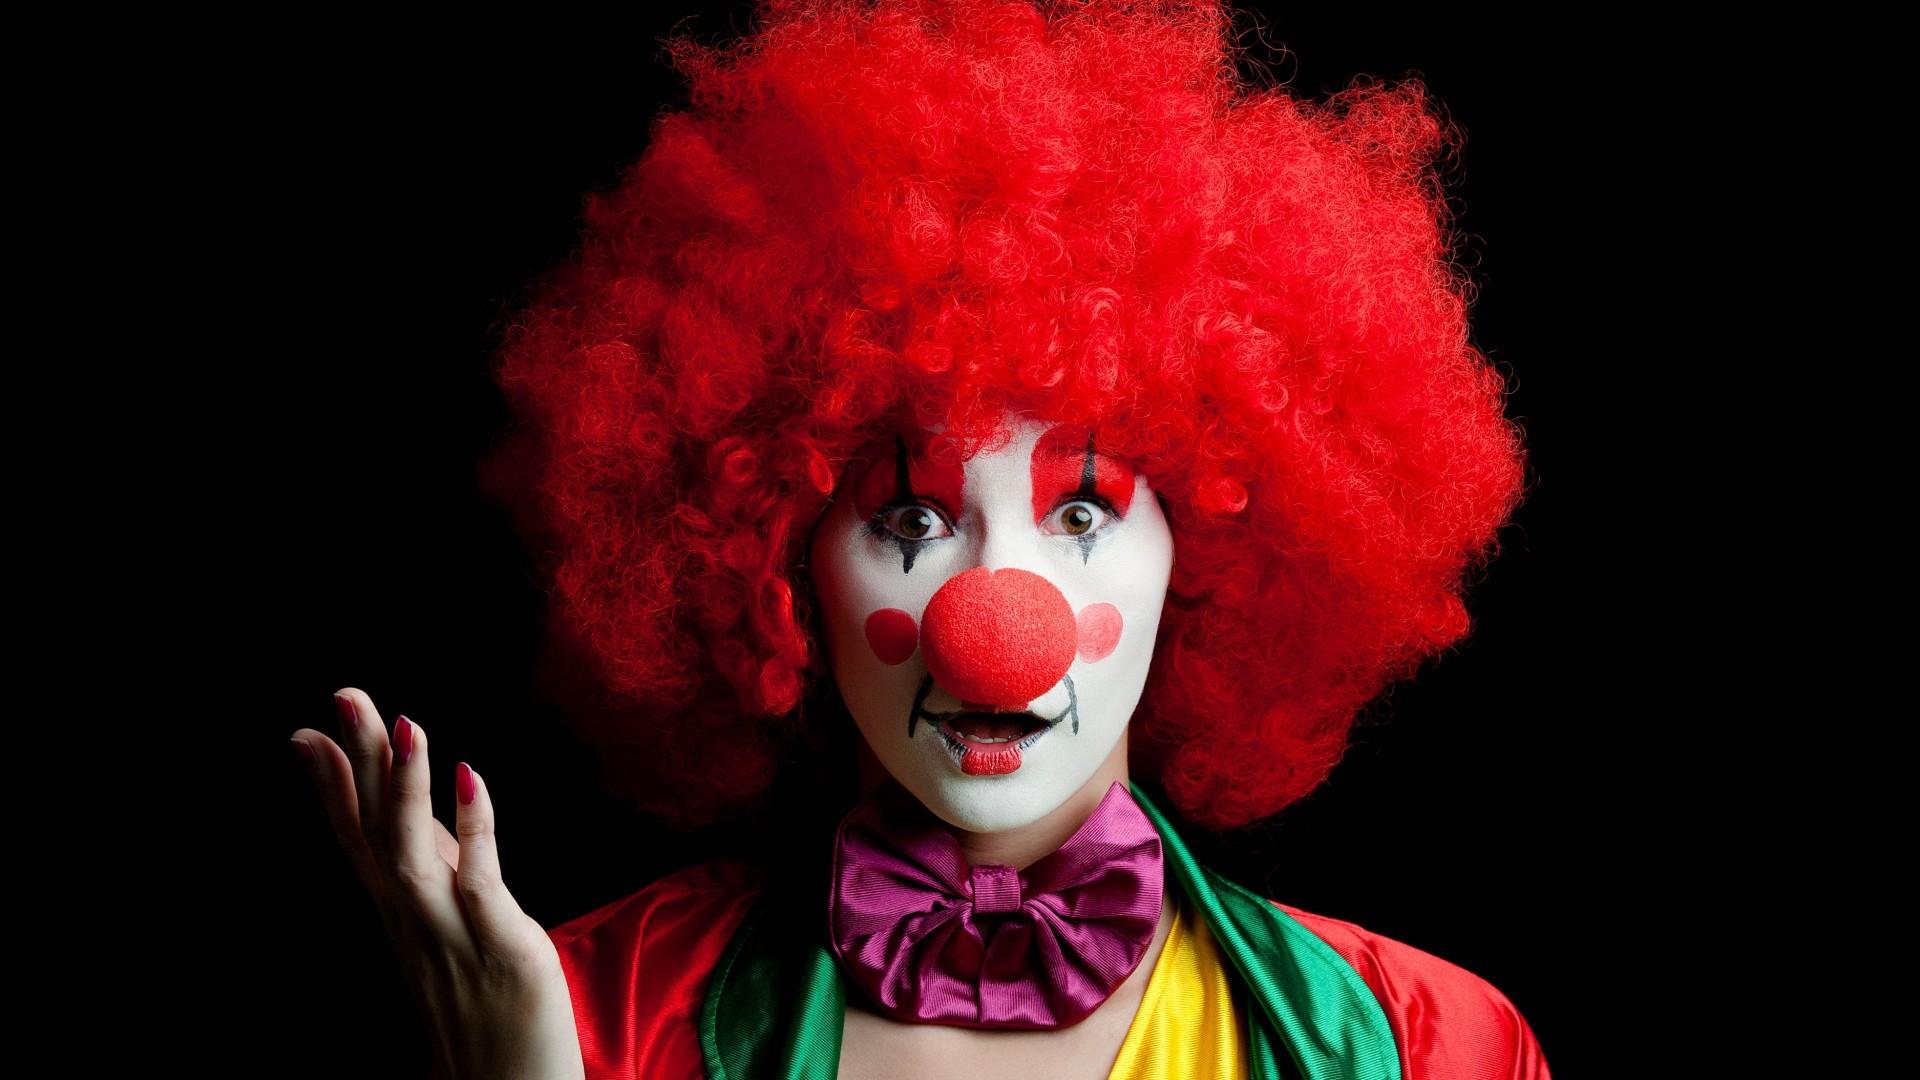 Full HD 1080p Clown Wallpapers HD, Desktop Backgrounds 1920×1080